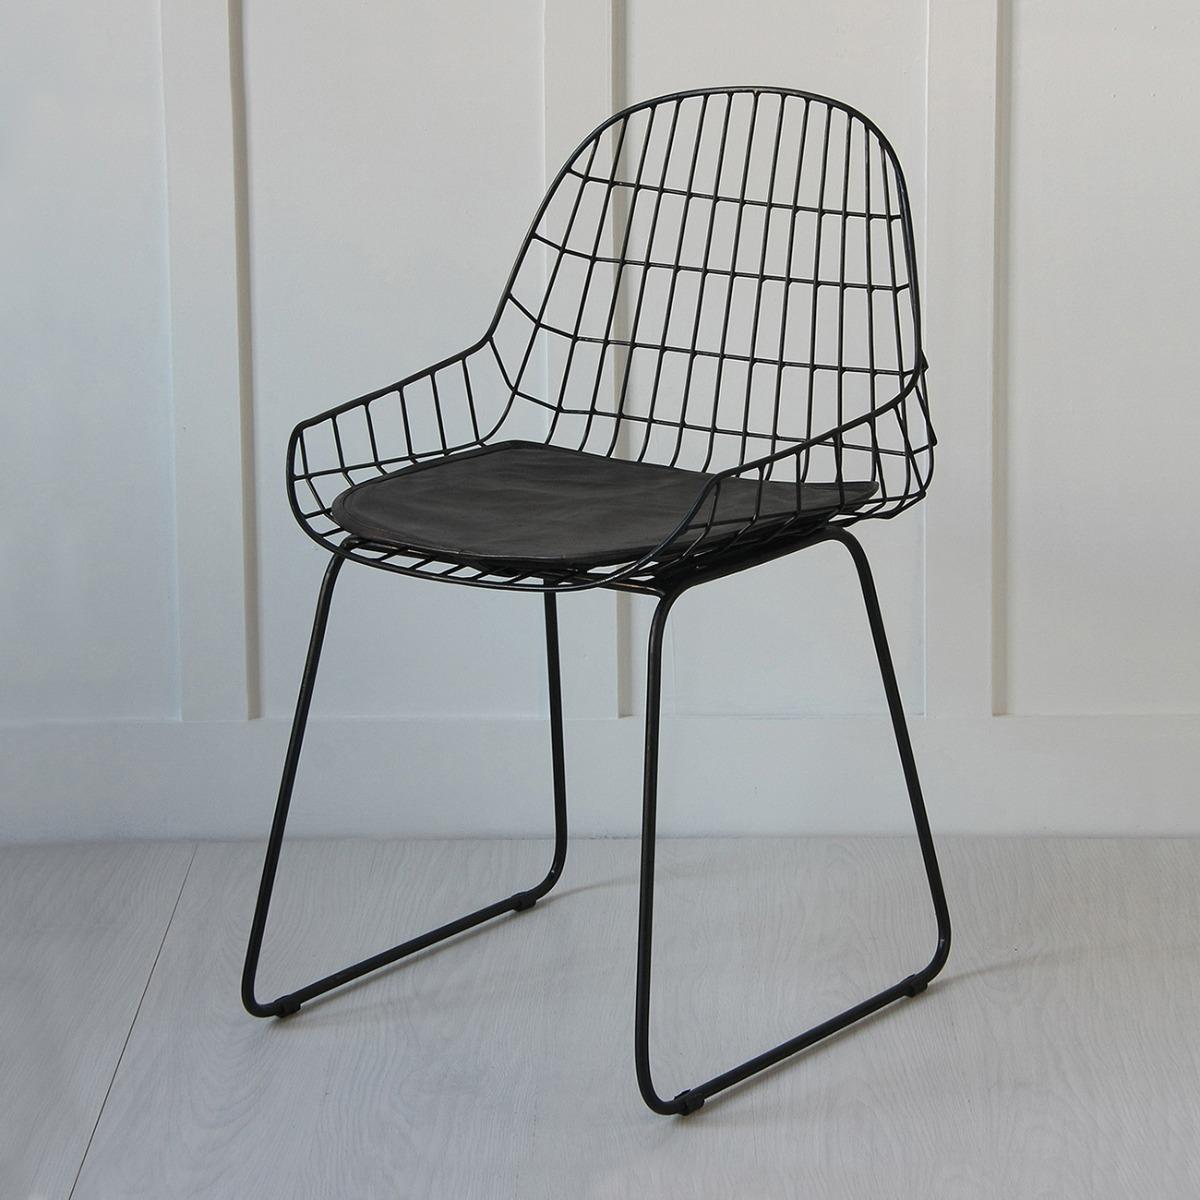 Black Wire Arm Chair, Black Seat Pad